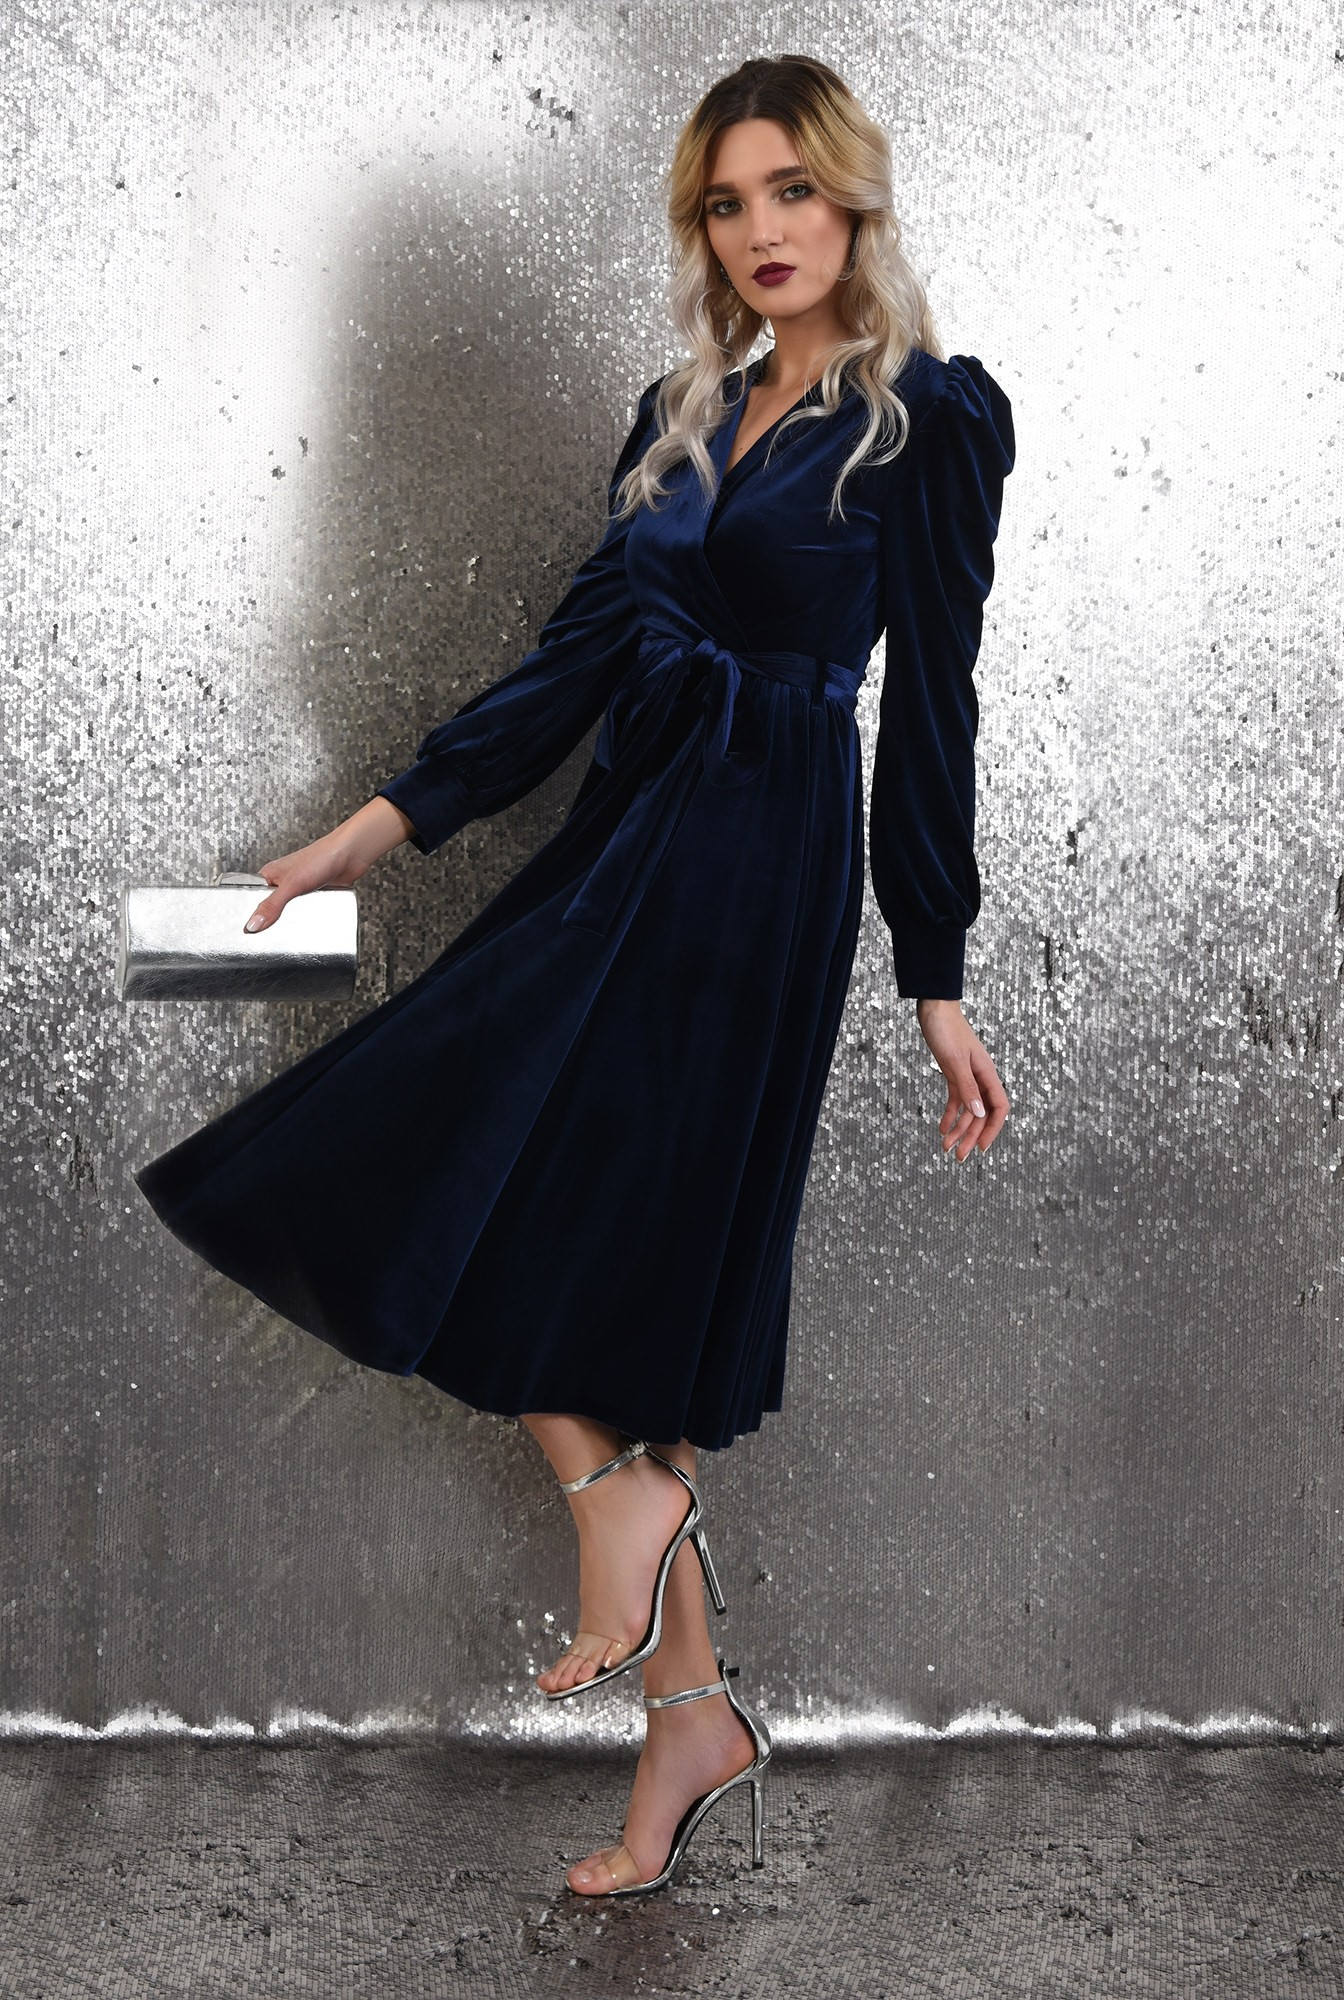 0 - rochie eleganta, midi, evazata, cu cordon, maneci lungi